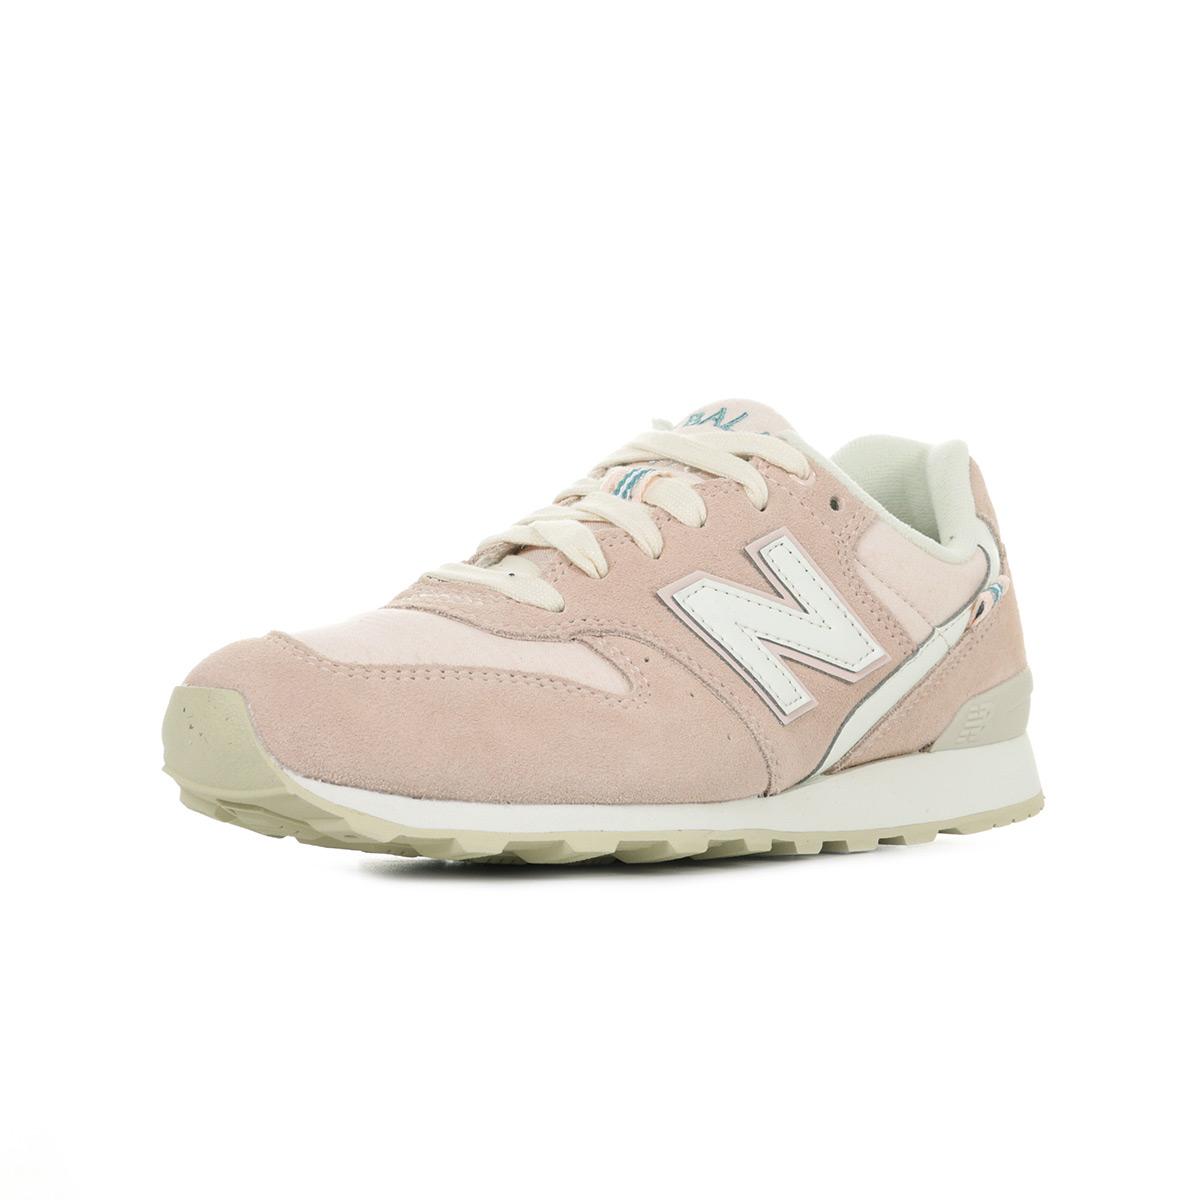 new balance 996 femme kaki rose